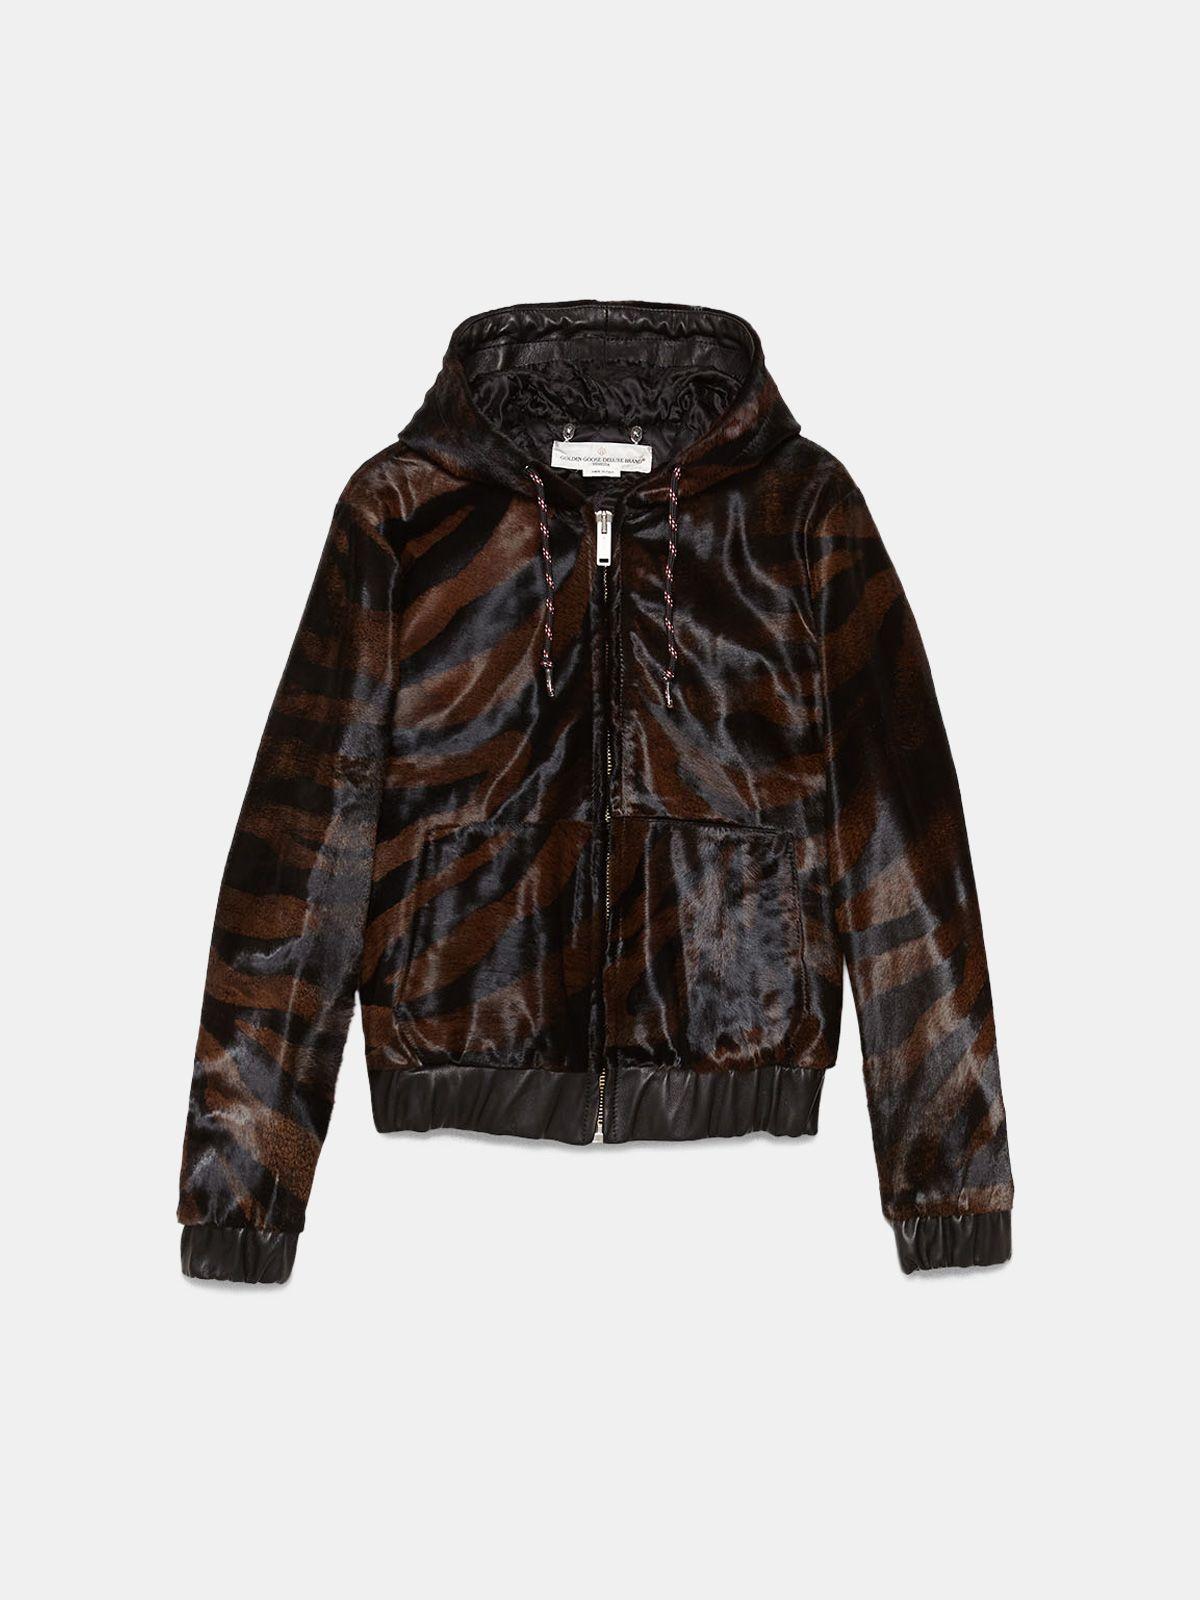 Golden Goose - Oniyuri sweatshirt in zebra-print pony skin with hood  in